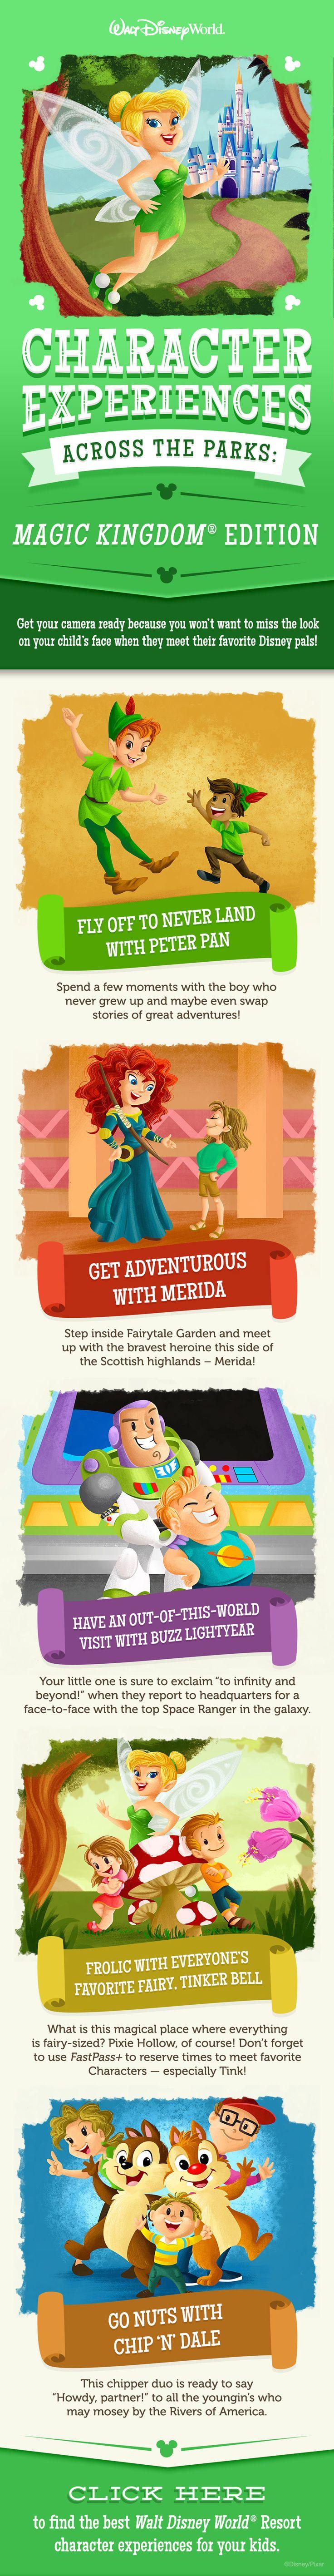 Walt Disney World character experiences you won't want to miss at Magic Kingdom!